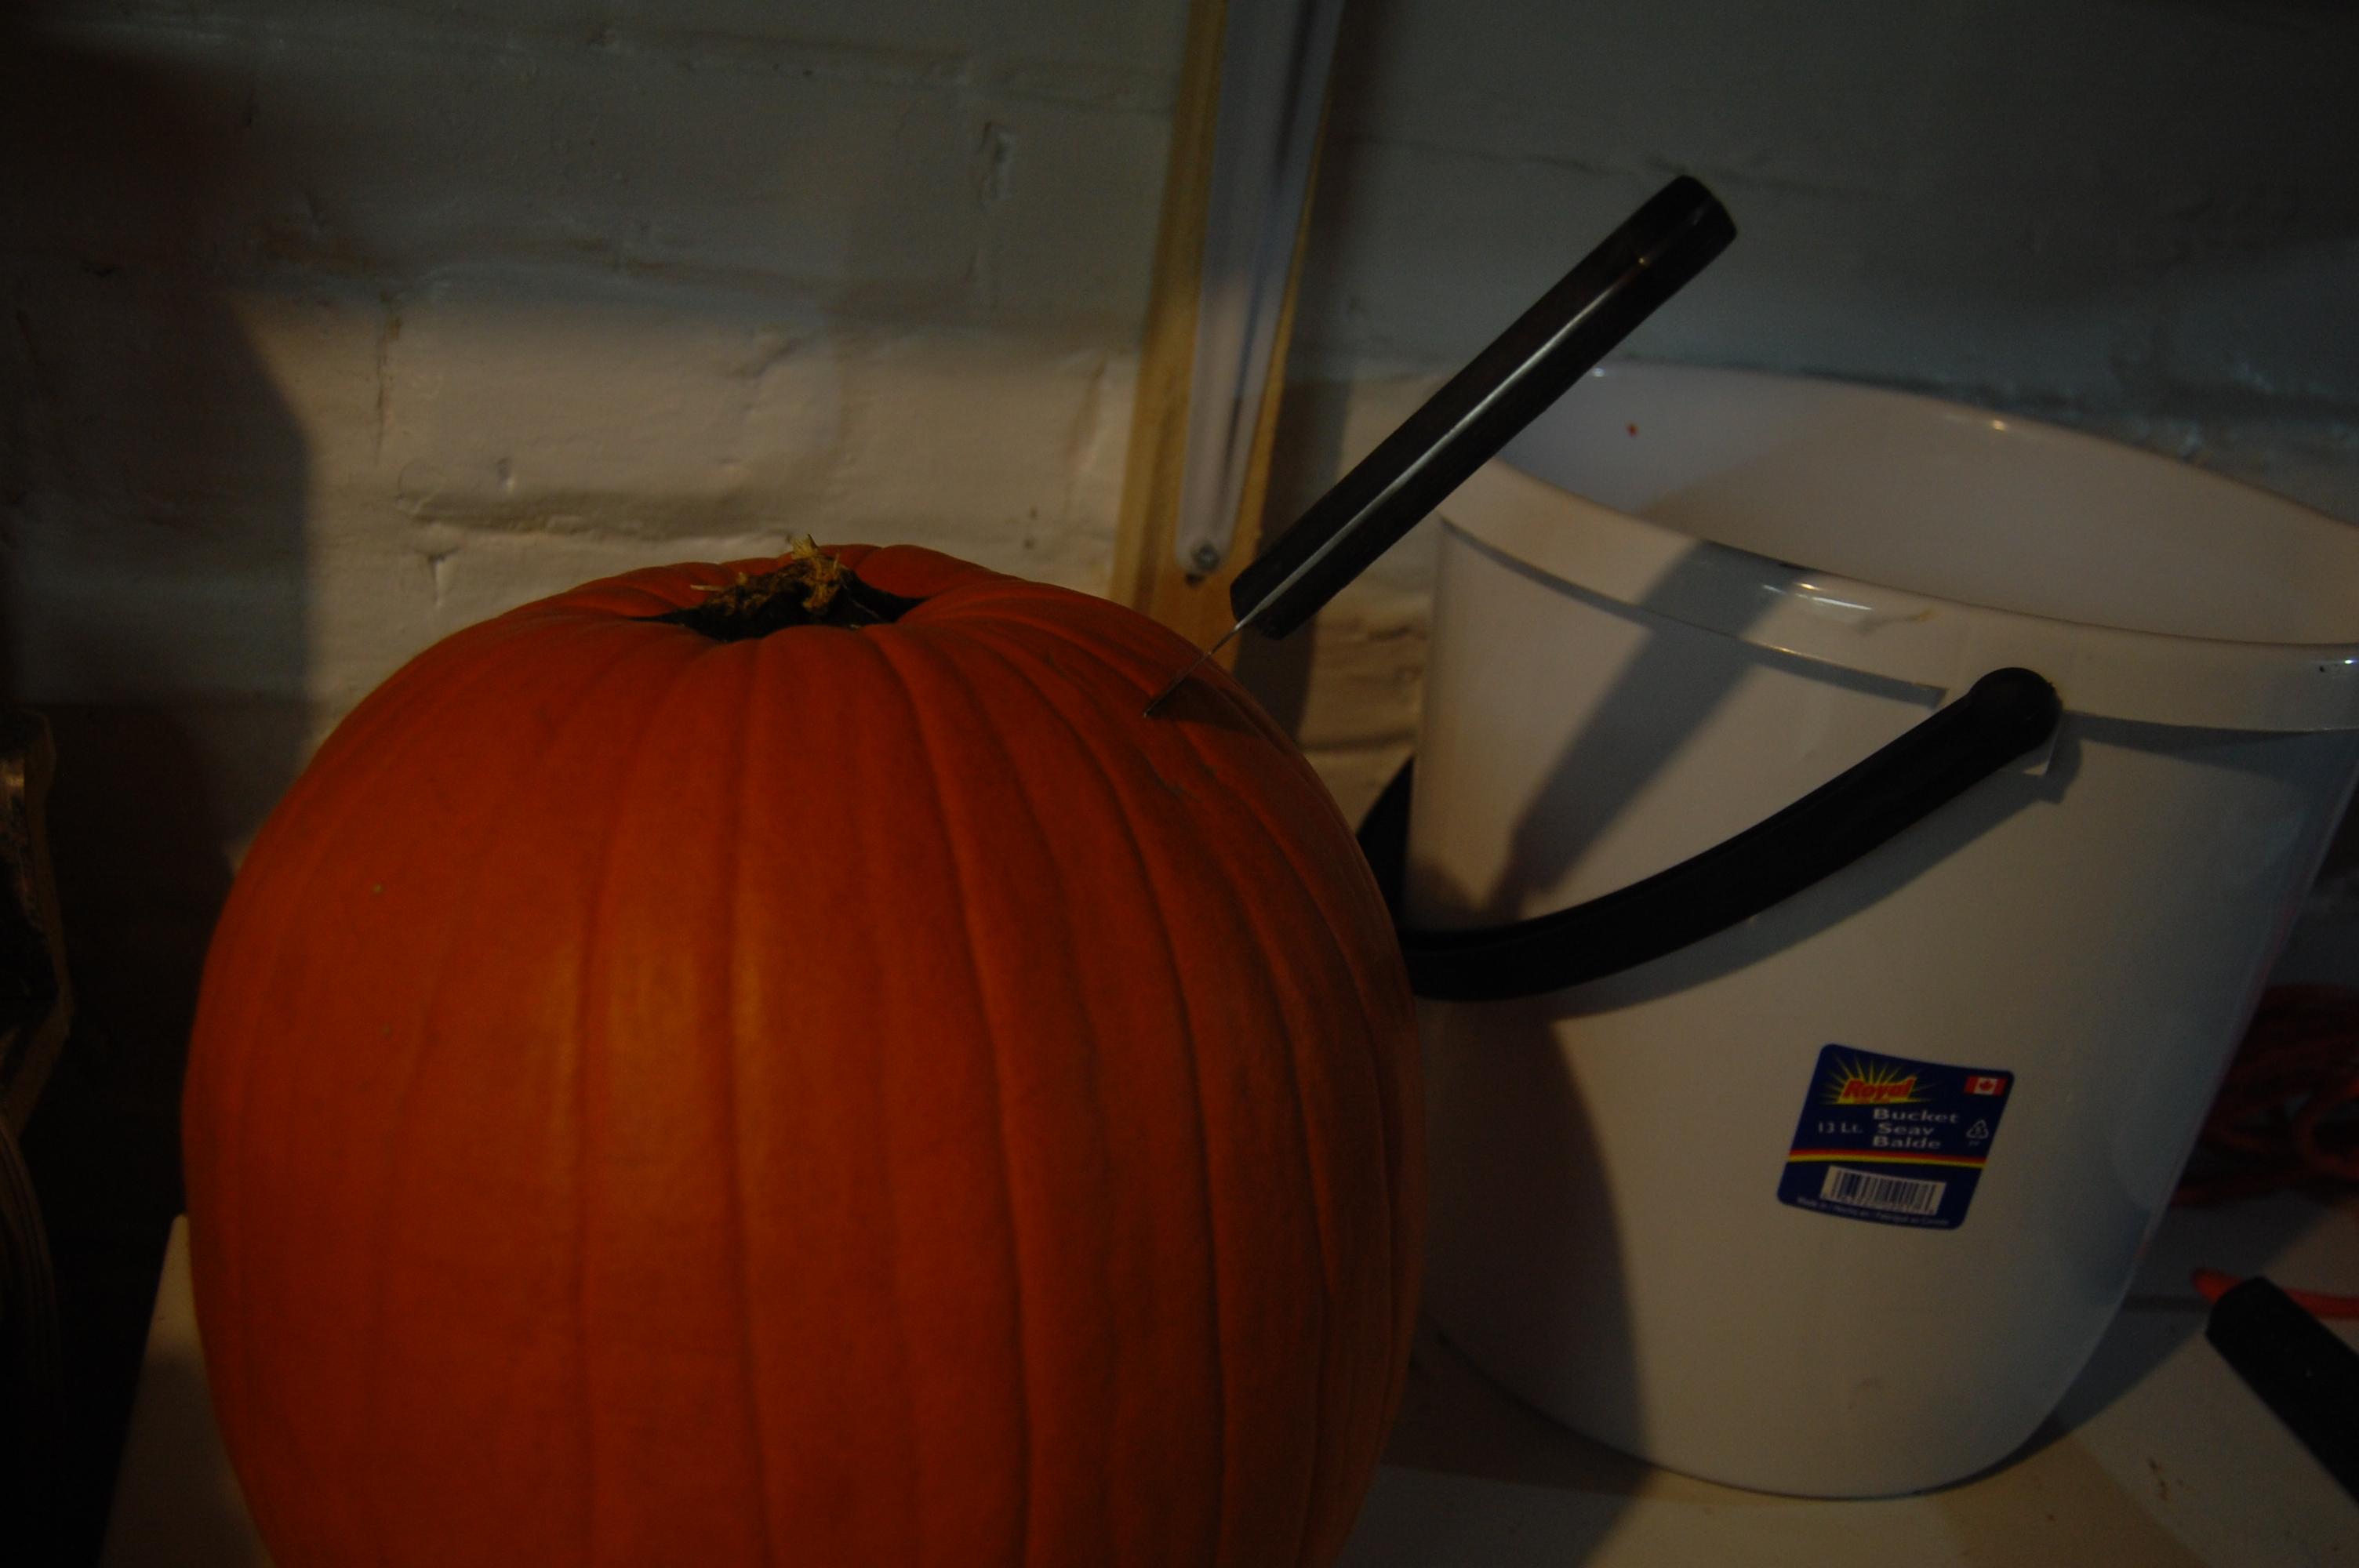 Picture of Cut Open the Pumpkin